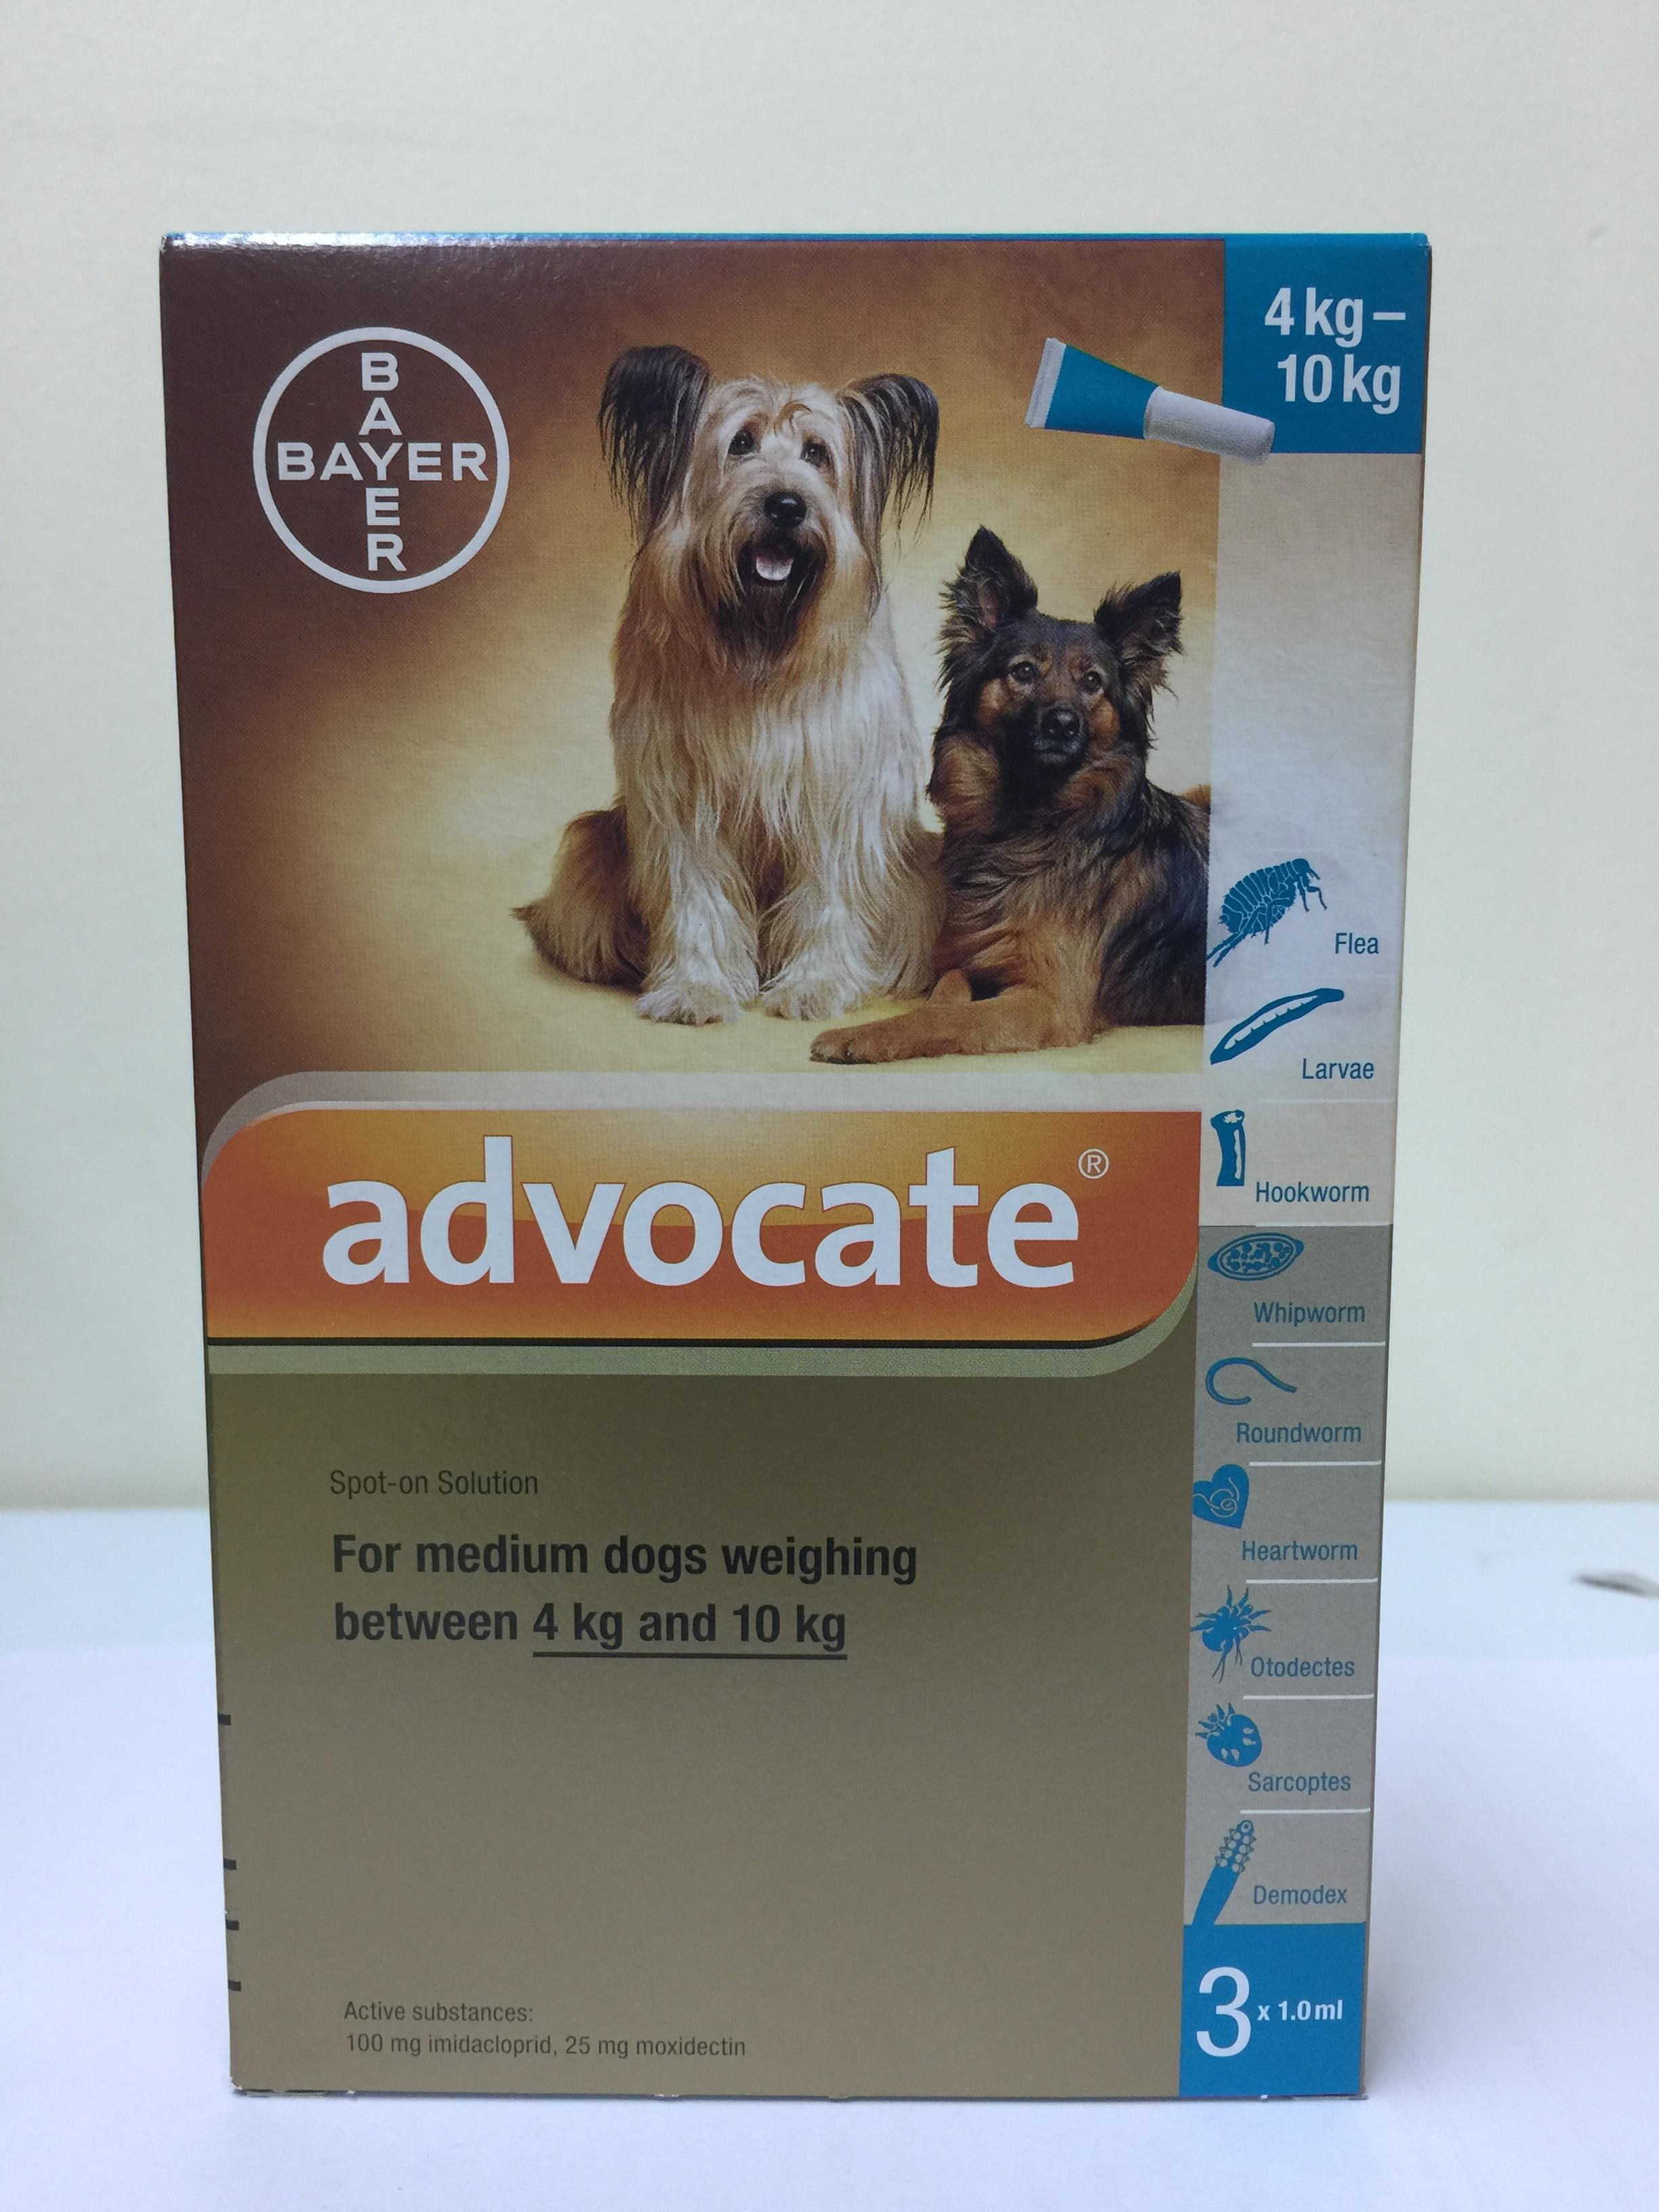 Bayer Advocate for dogs สำหรับสุนัข 4 - 10 kg บรรจุ 3 หลอด Exp.09/18